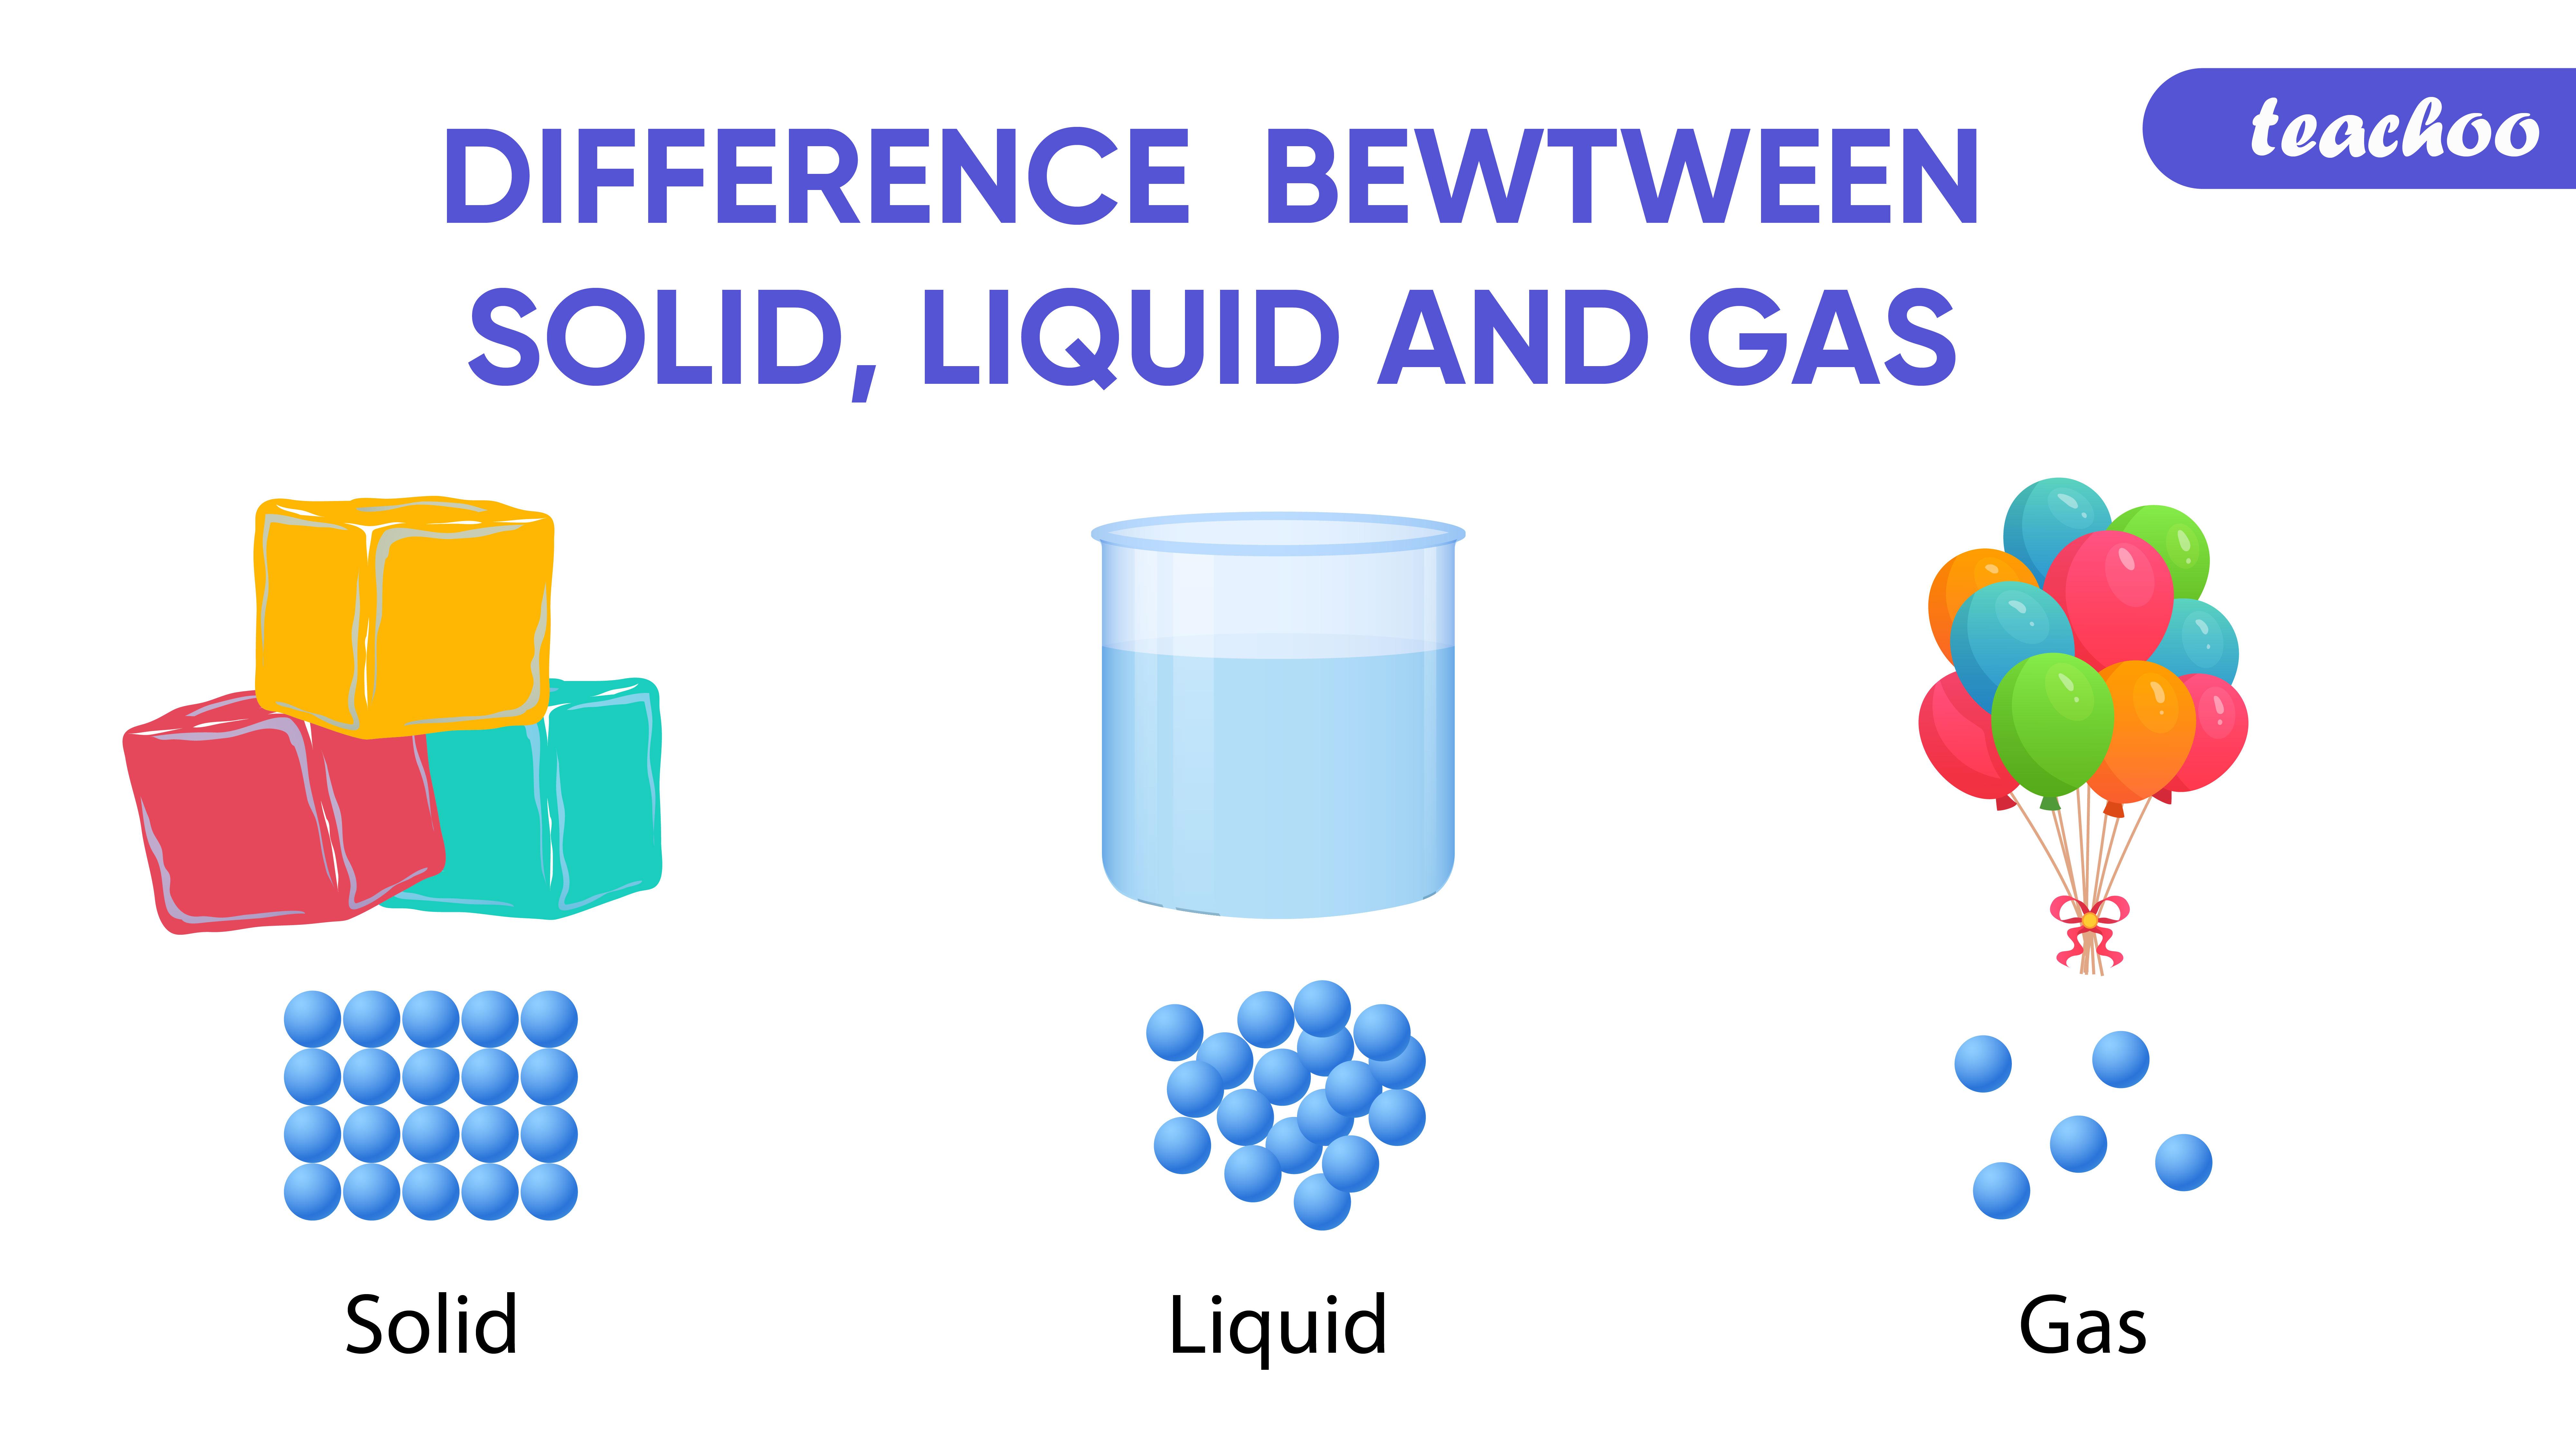 Difference between Solid, Liquid, Gas-Teachoo-01.jpg